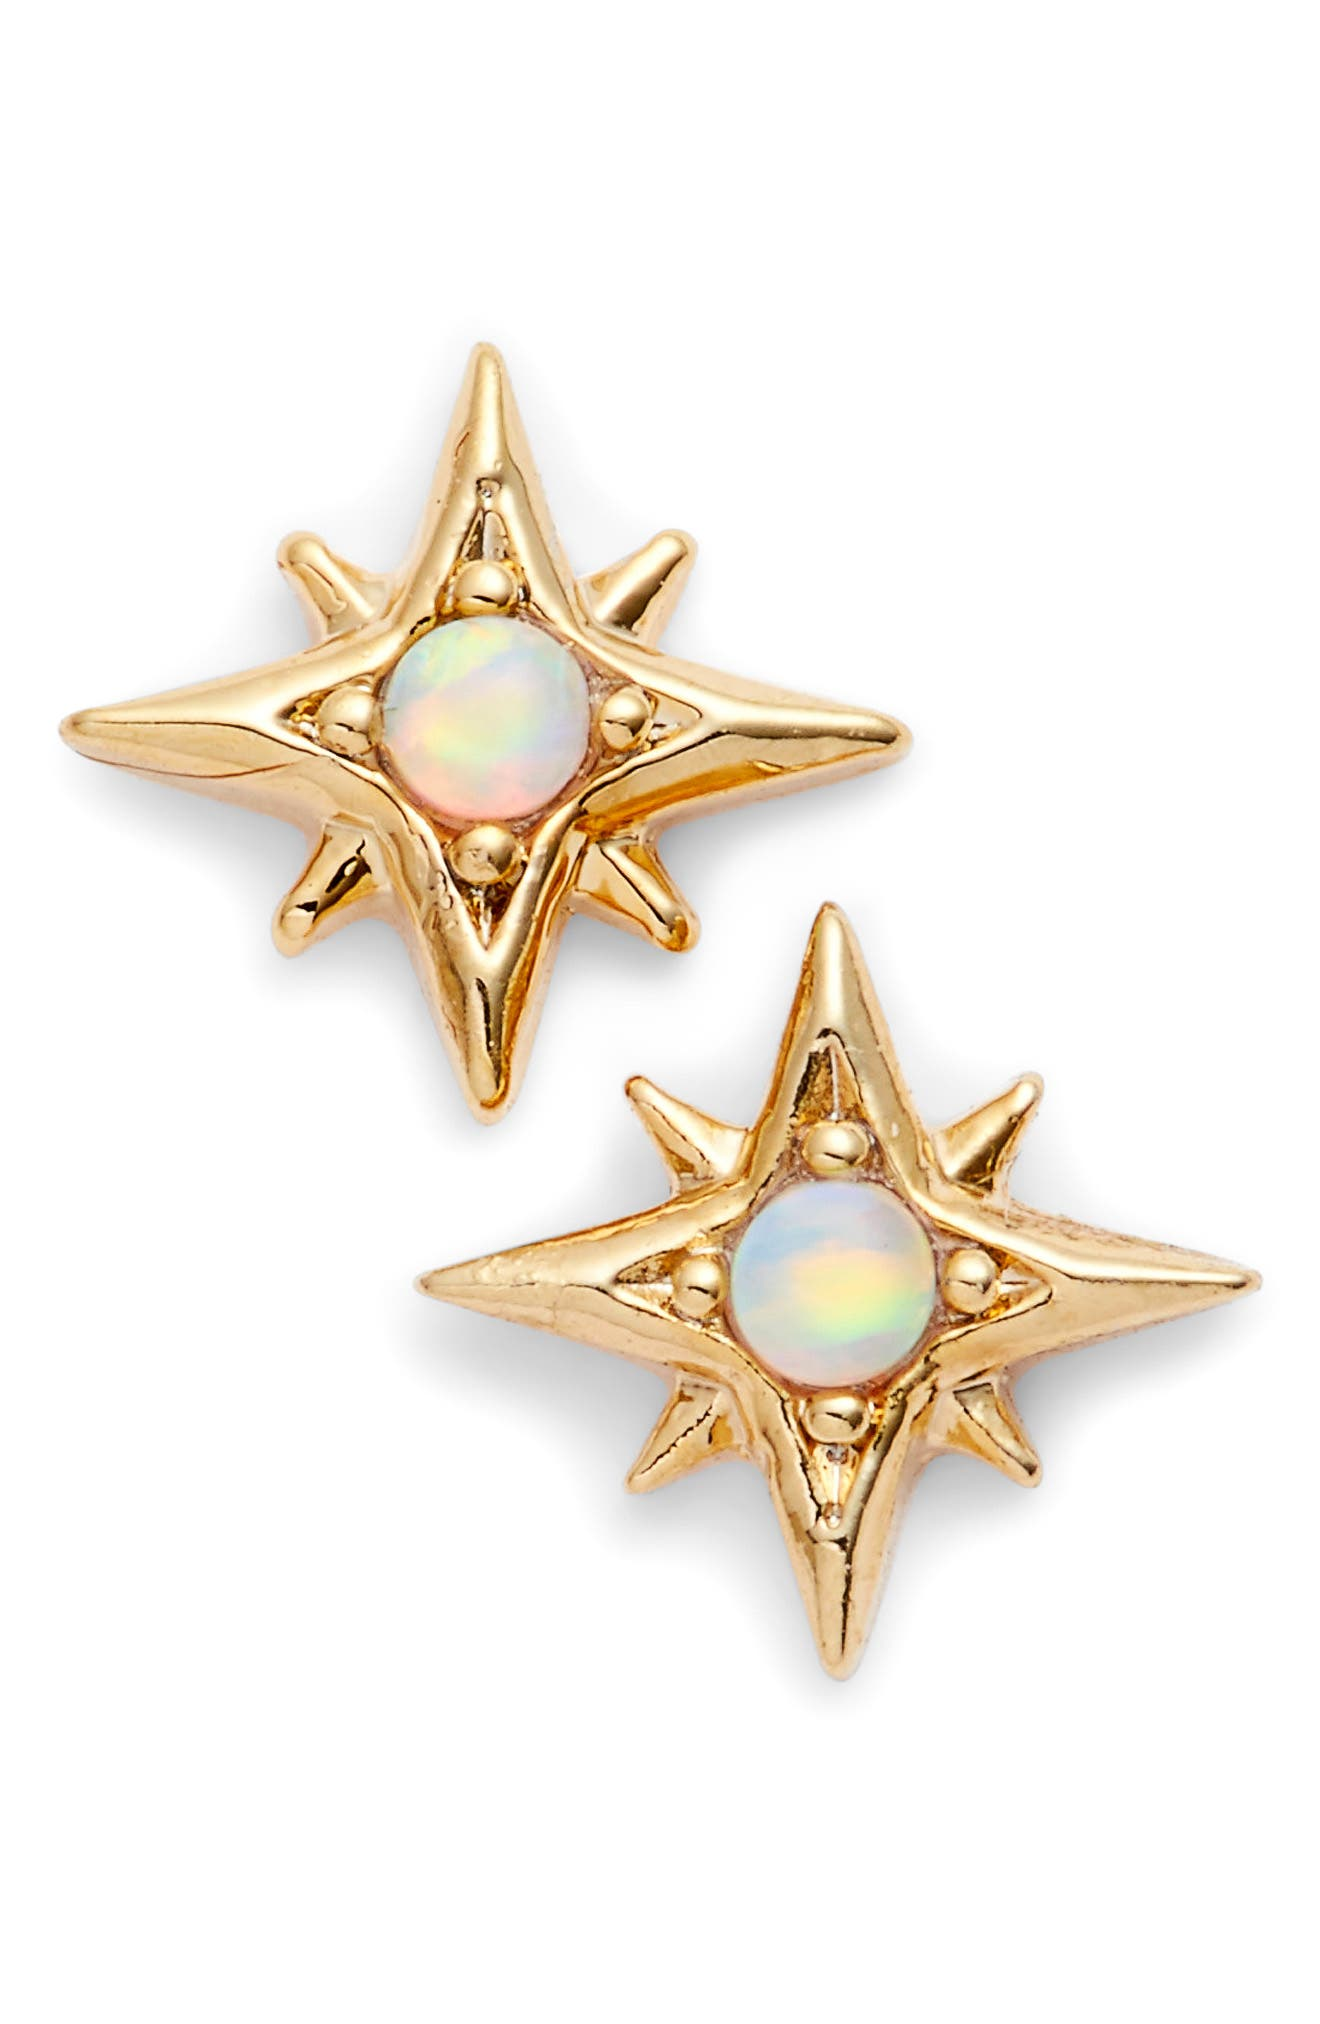 Sydee Cubic Zirconia Stud Earrings,                             Main thumbnail 1, color,                             710